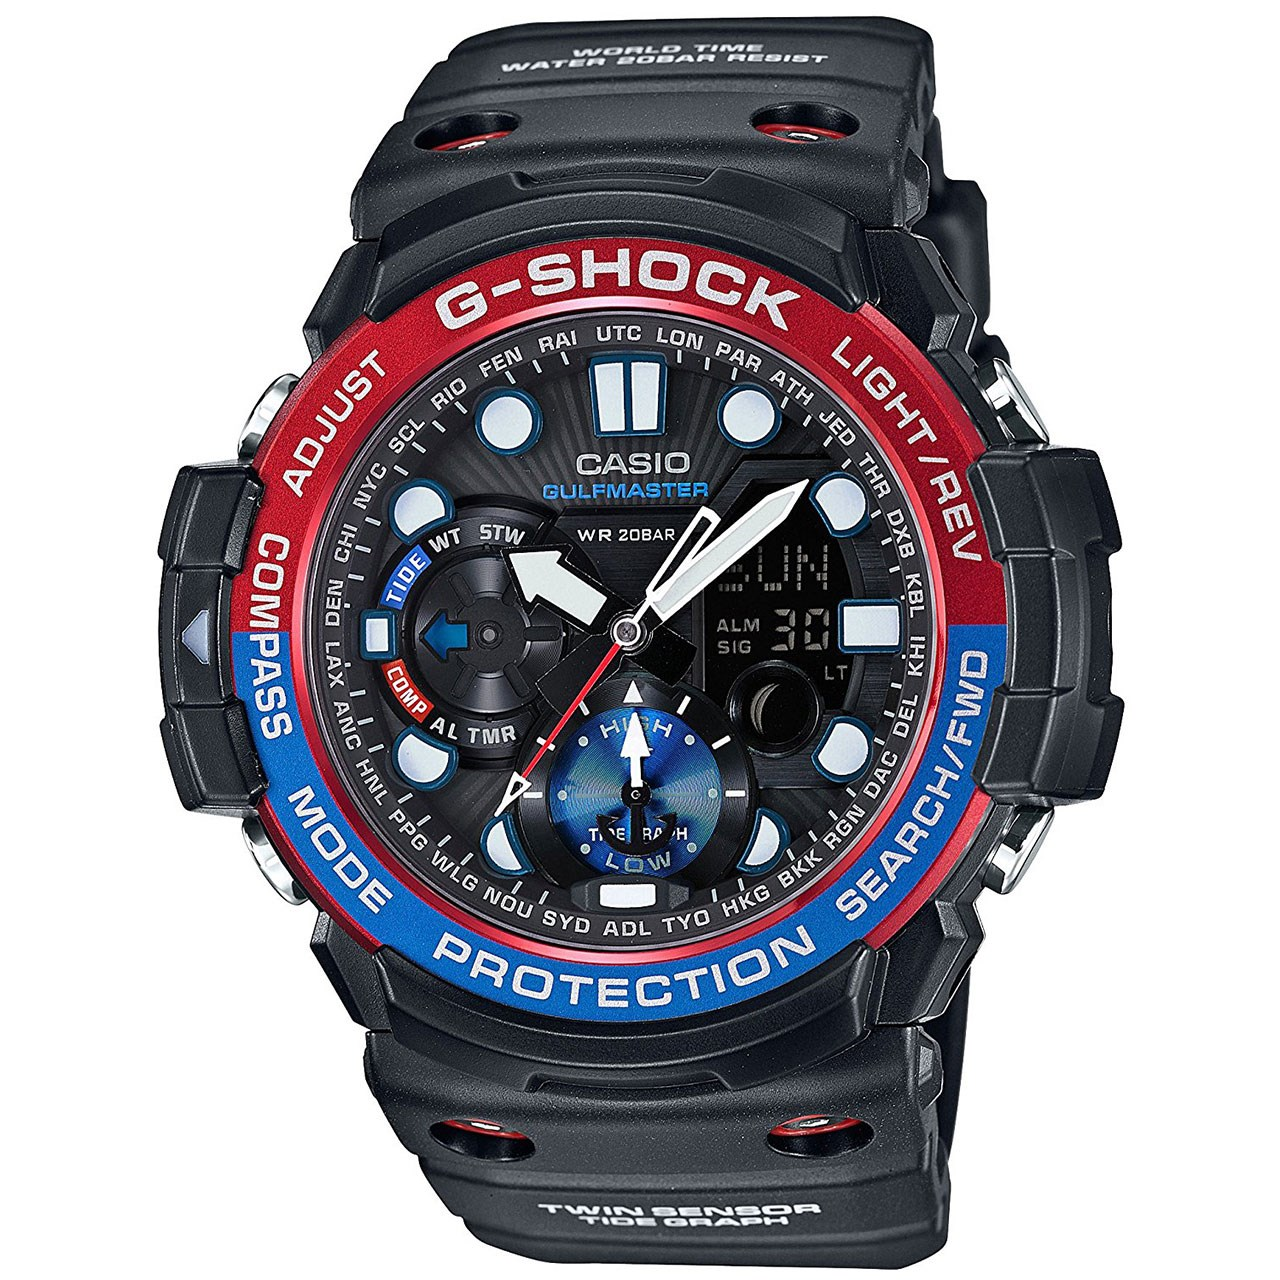 ساعت مچی عقربه ای مردانه کاسیو جی شاک مدل GN-1000-1ADR